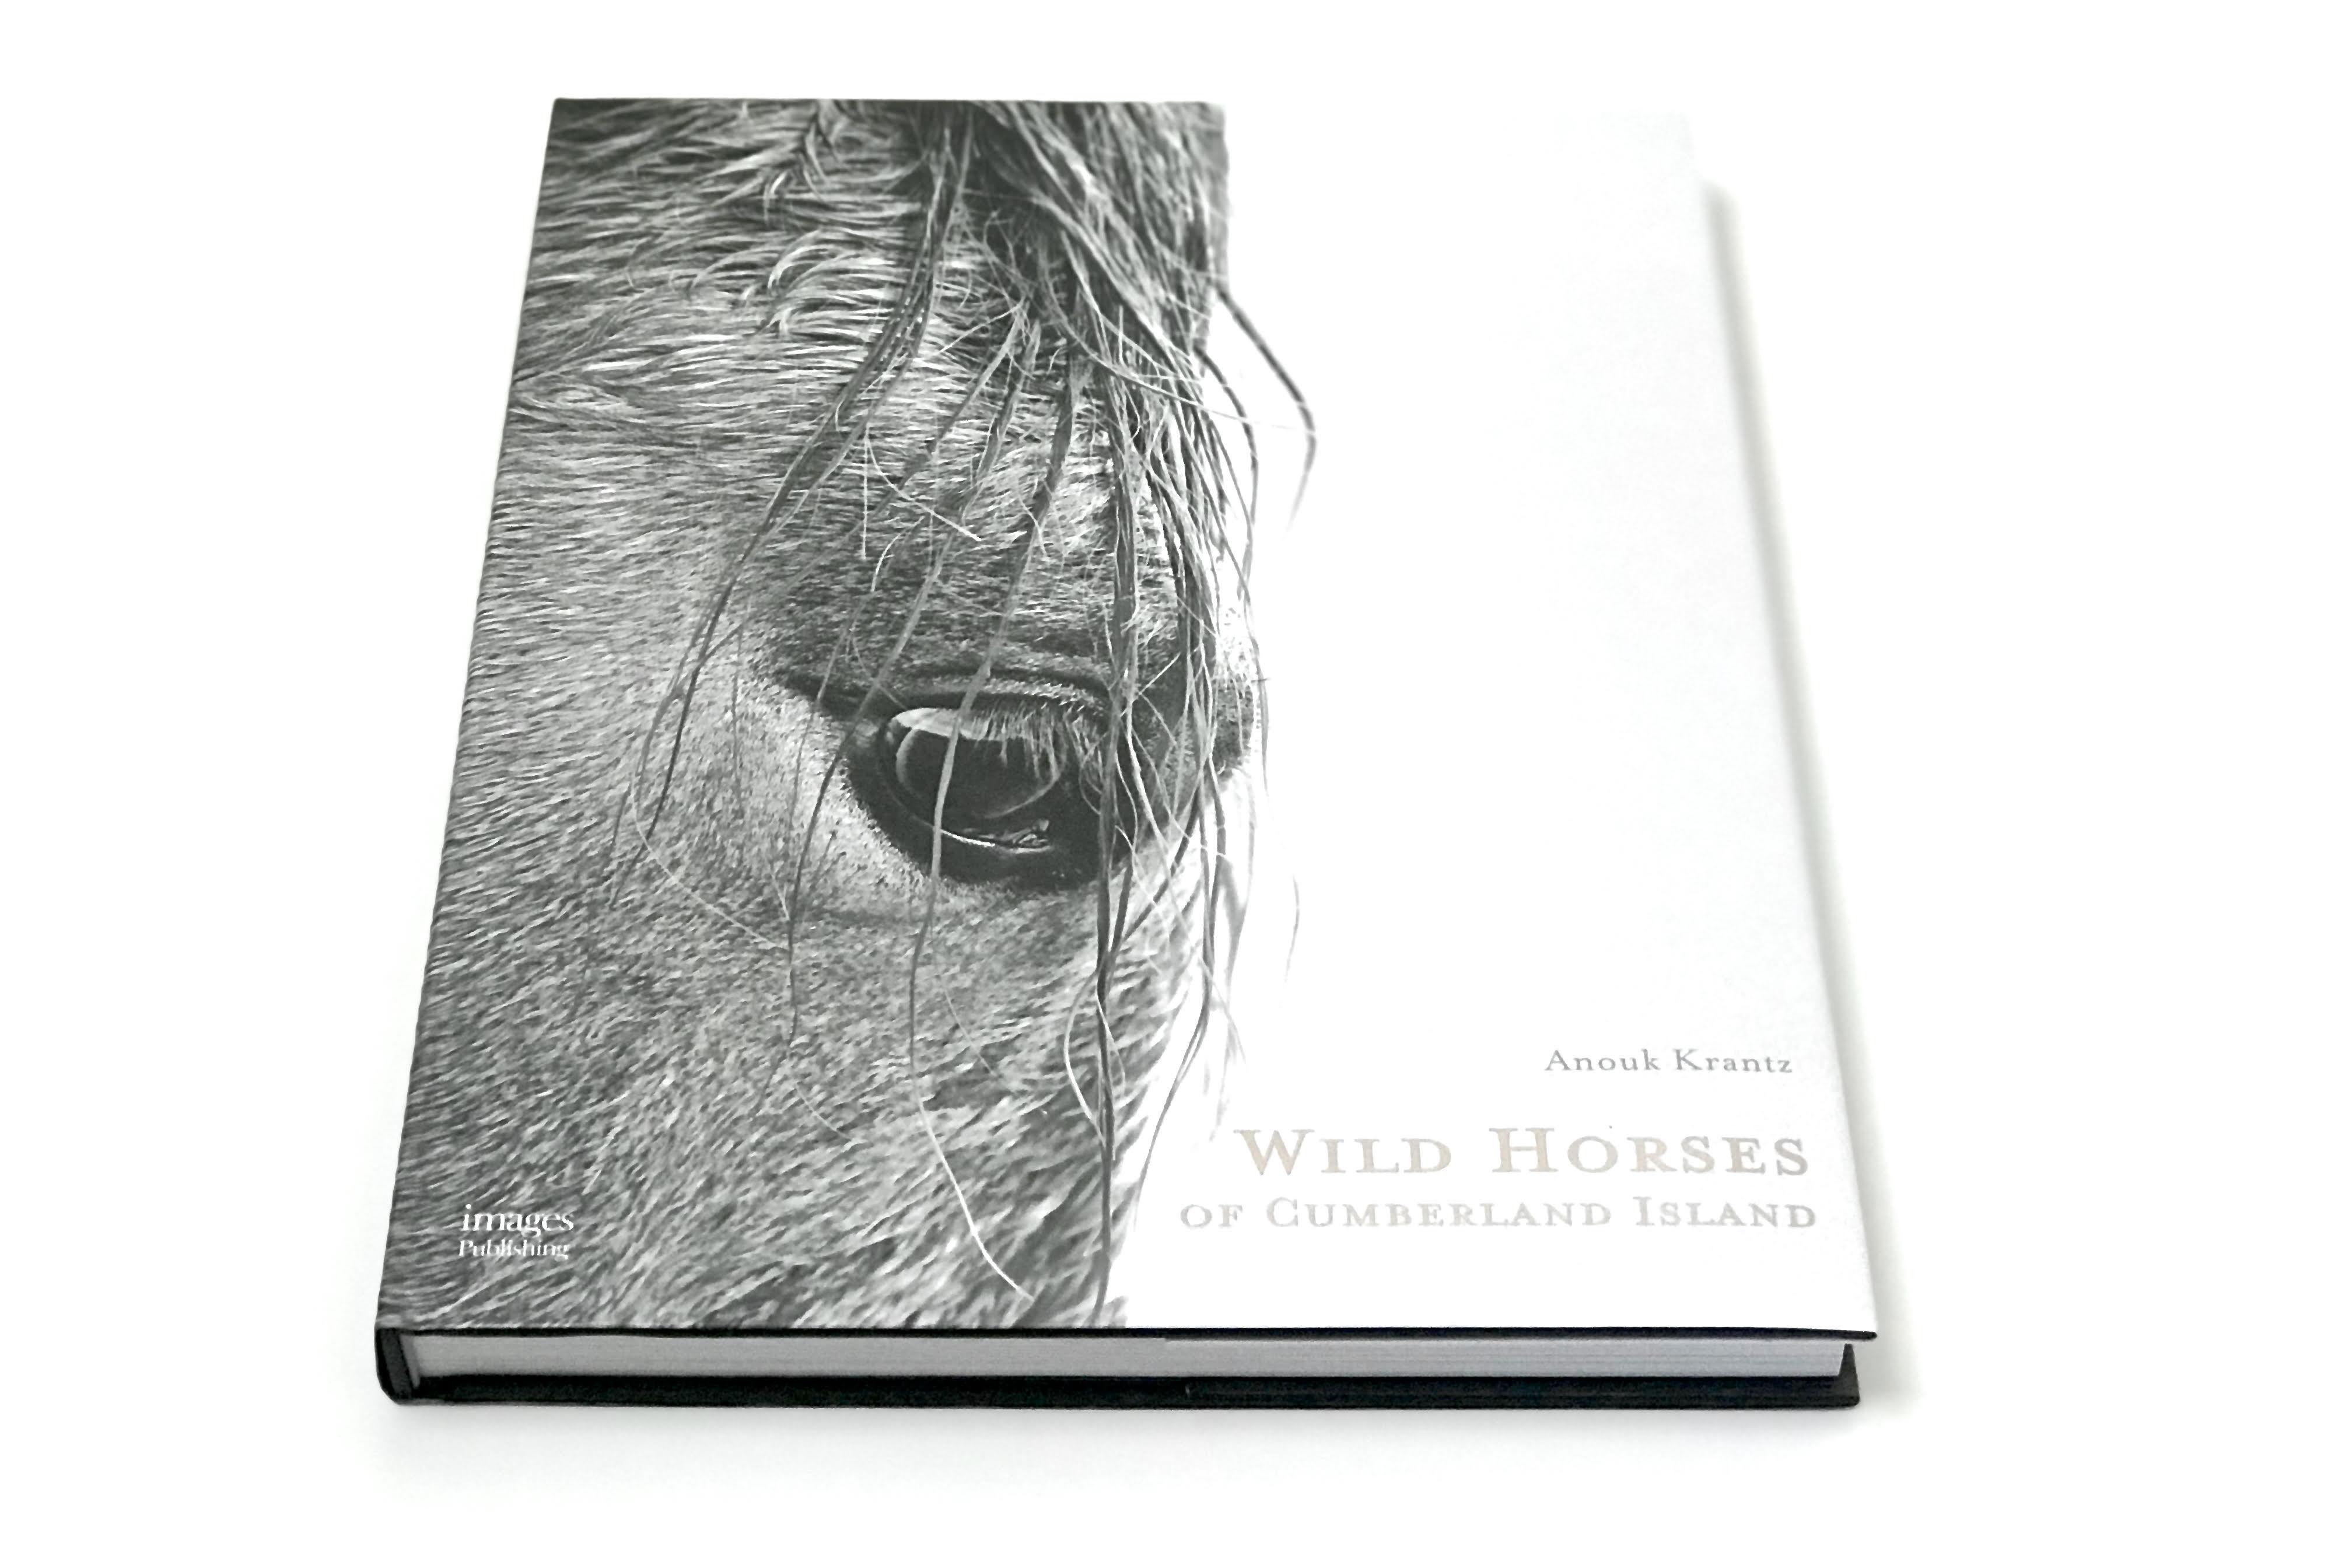 Wild Horses of Cumberland Island, hardcover book